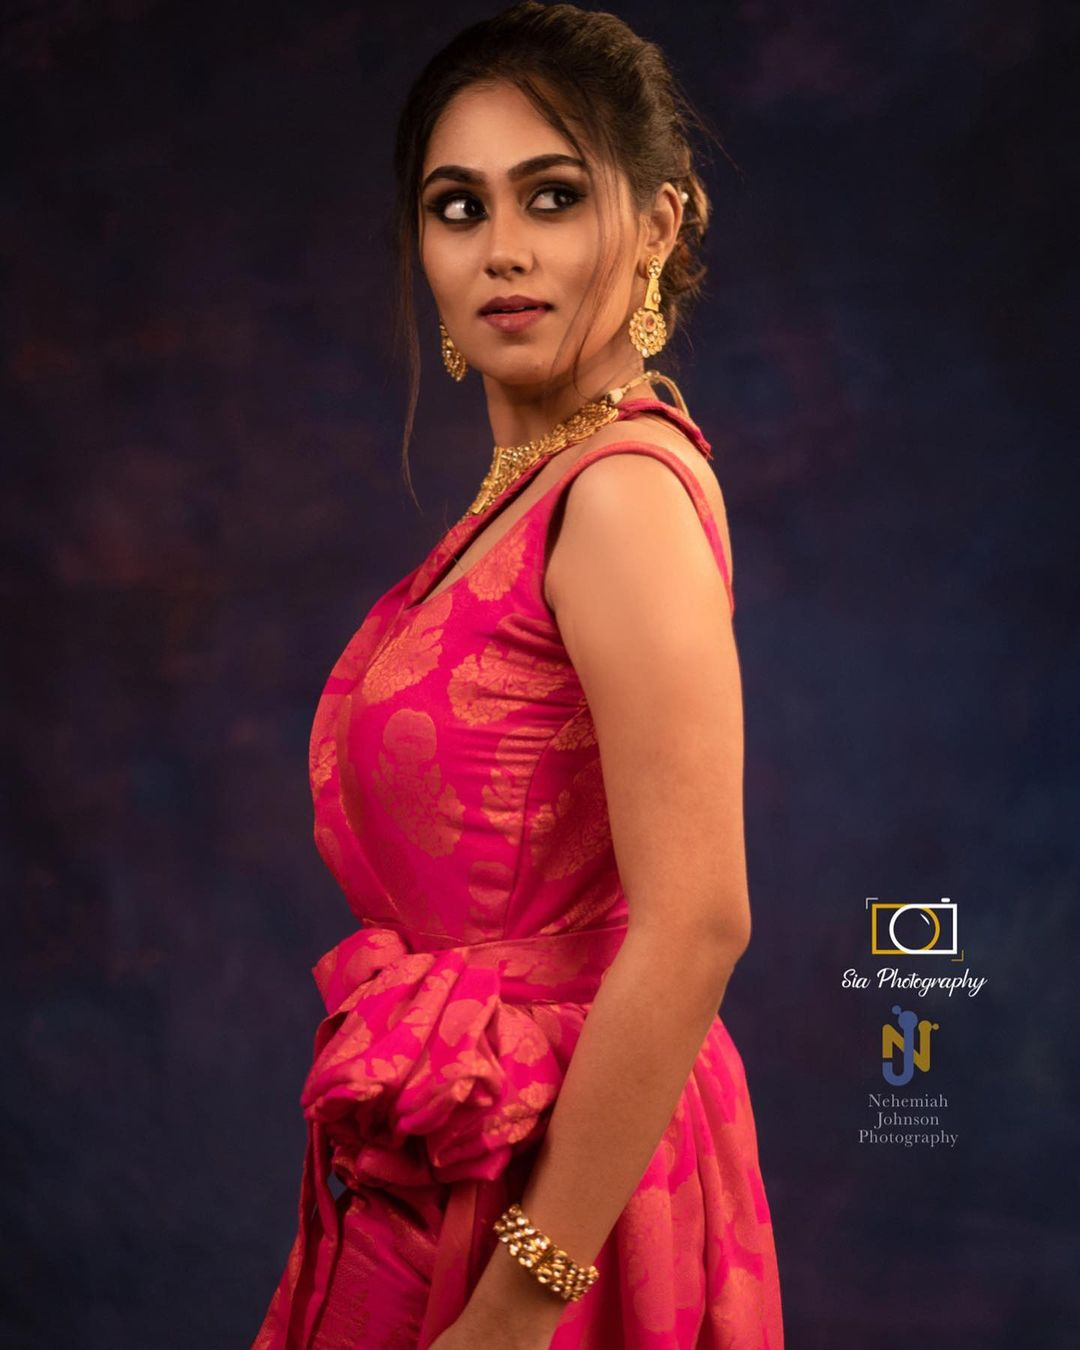 Sreethu Krishnan Photos hd (42)